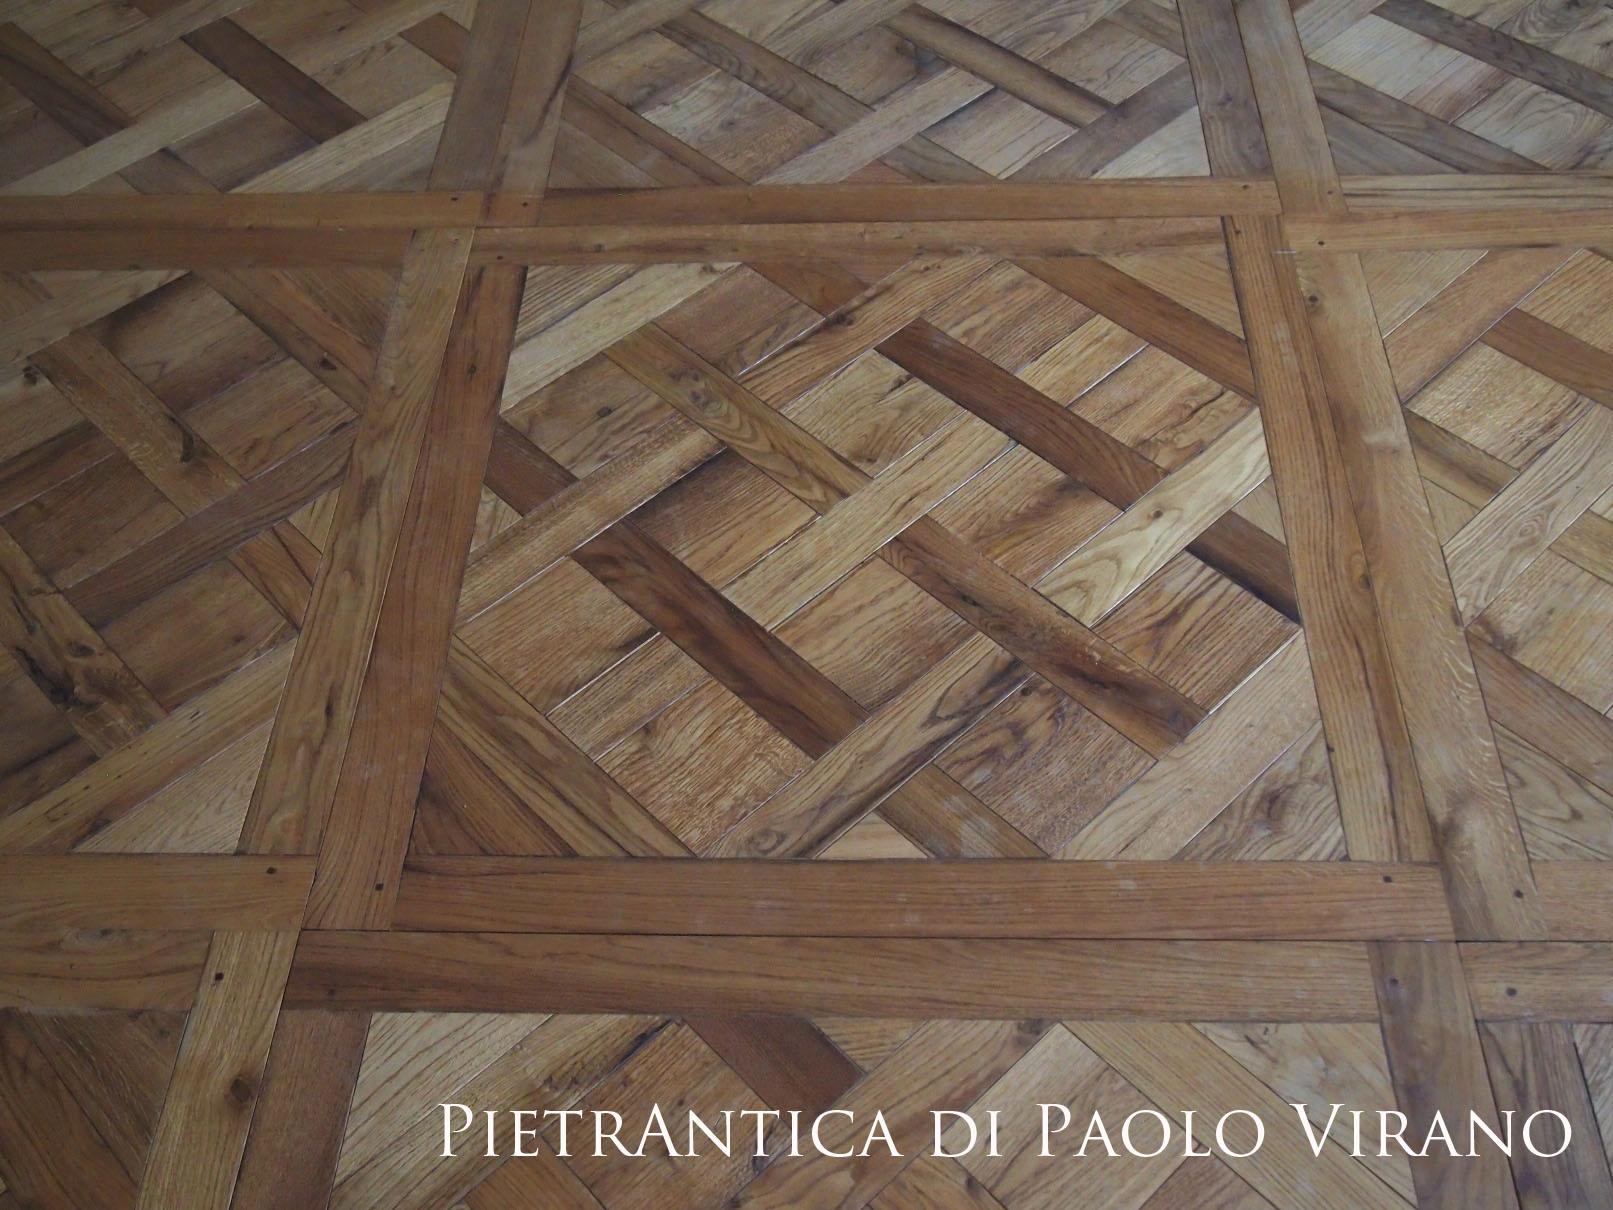 http://www.virano.it/images_pavimenti/legno/PAL05.JPG